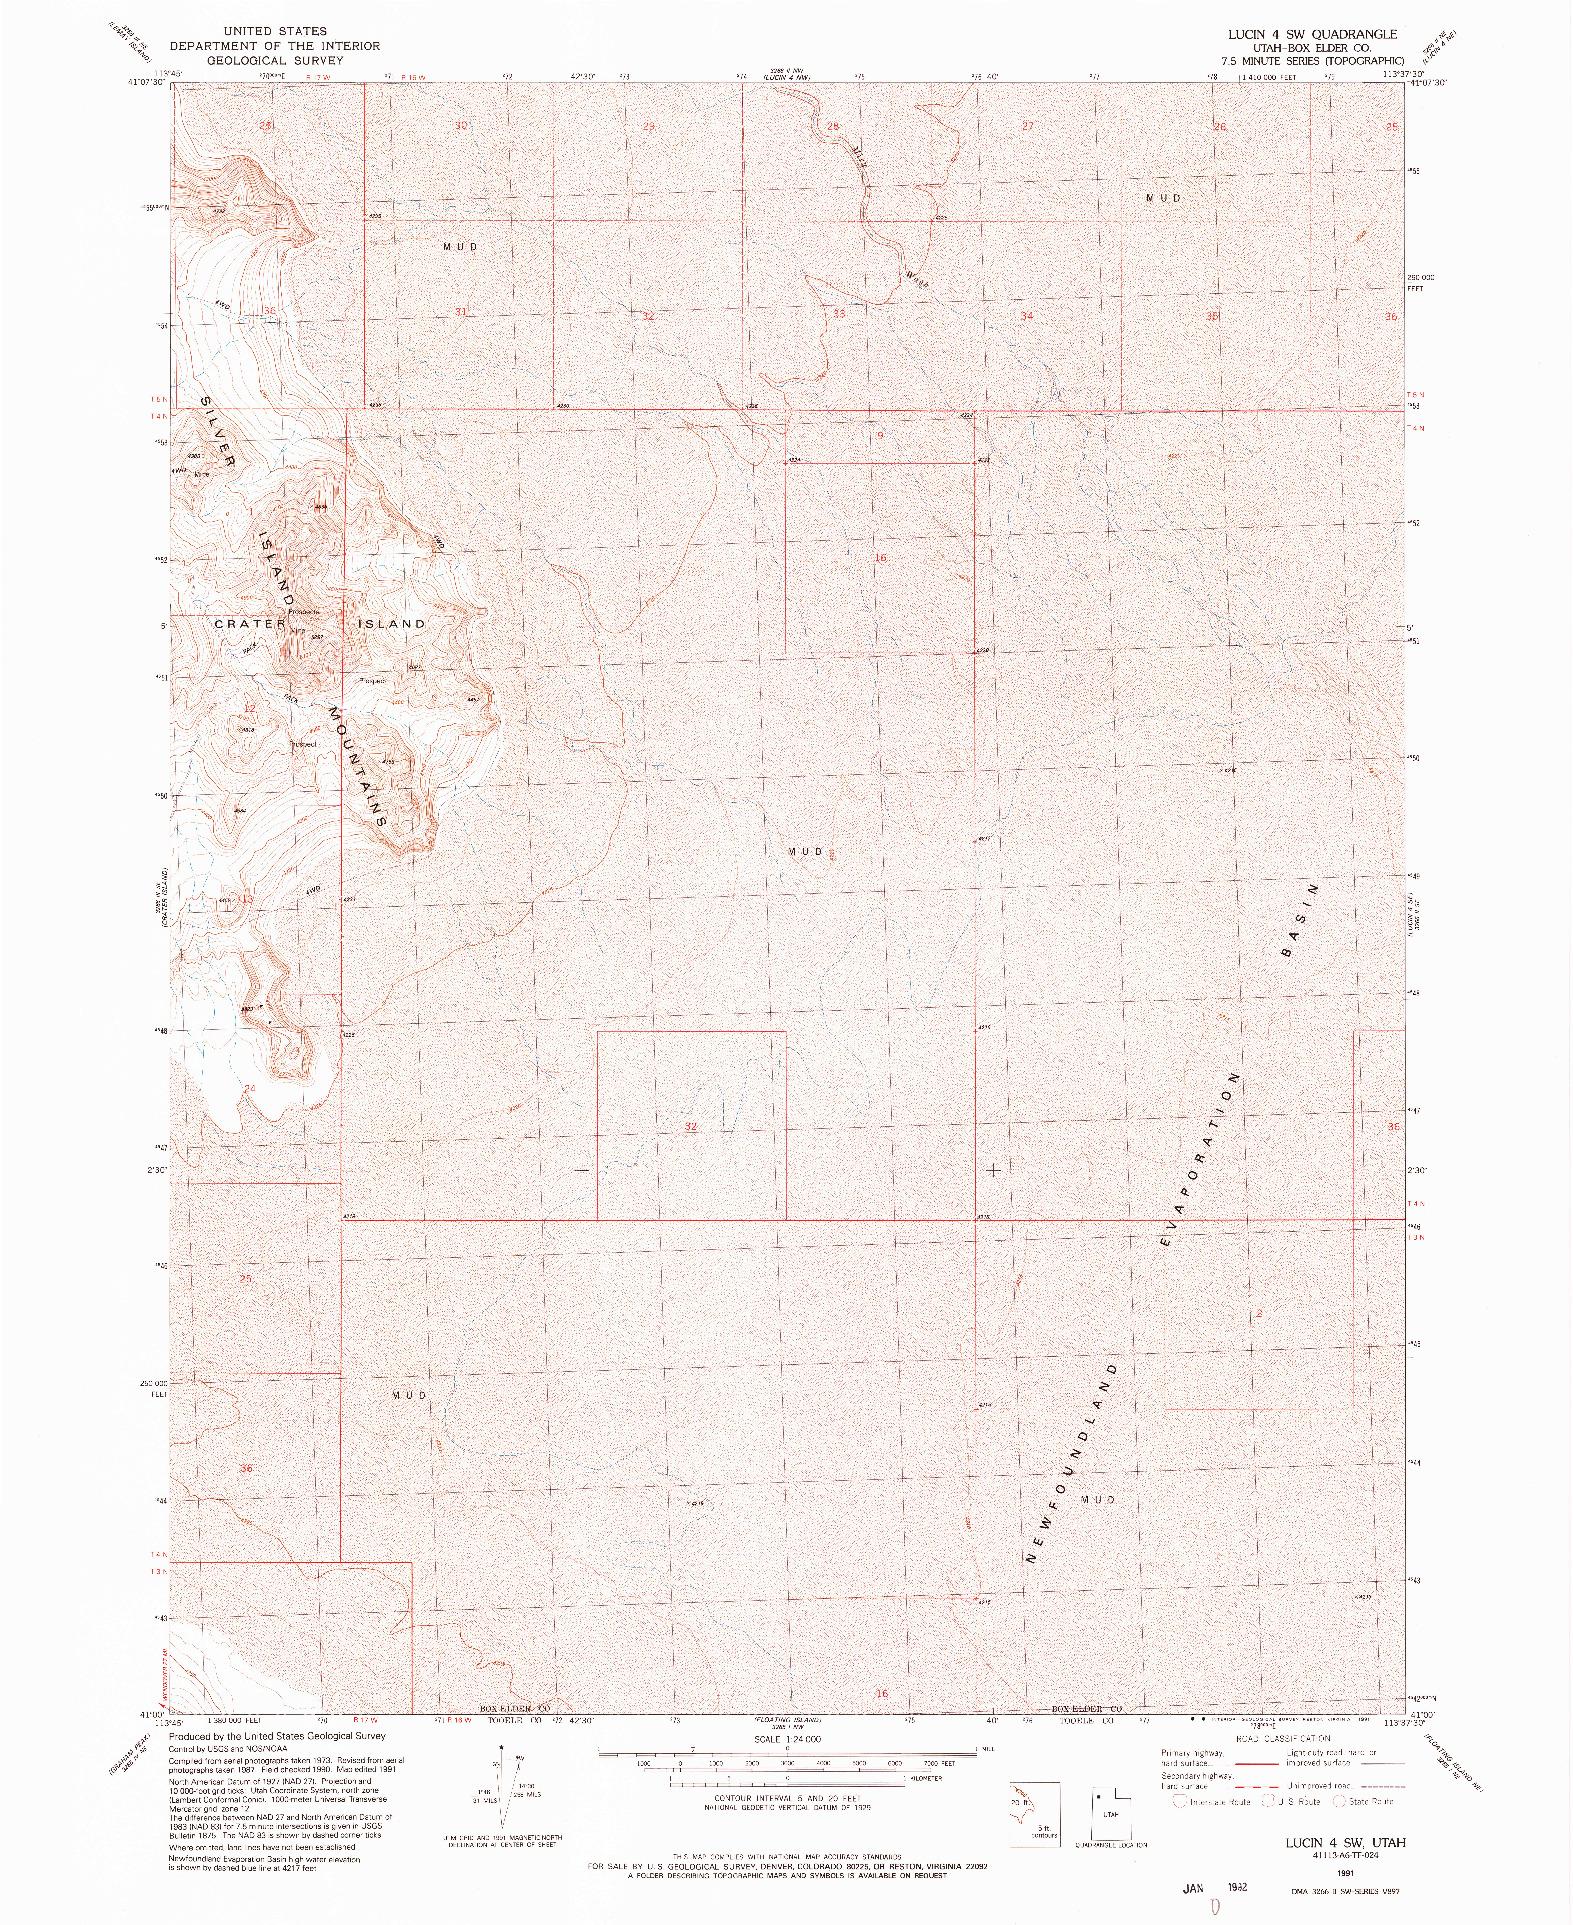 USGS 1:24000-SCALE QUADRANGLE FOR LUCIN 4 SW, UT 1991